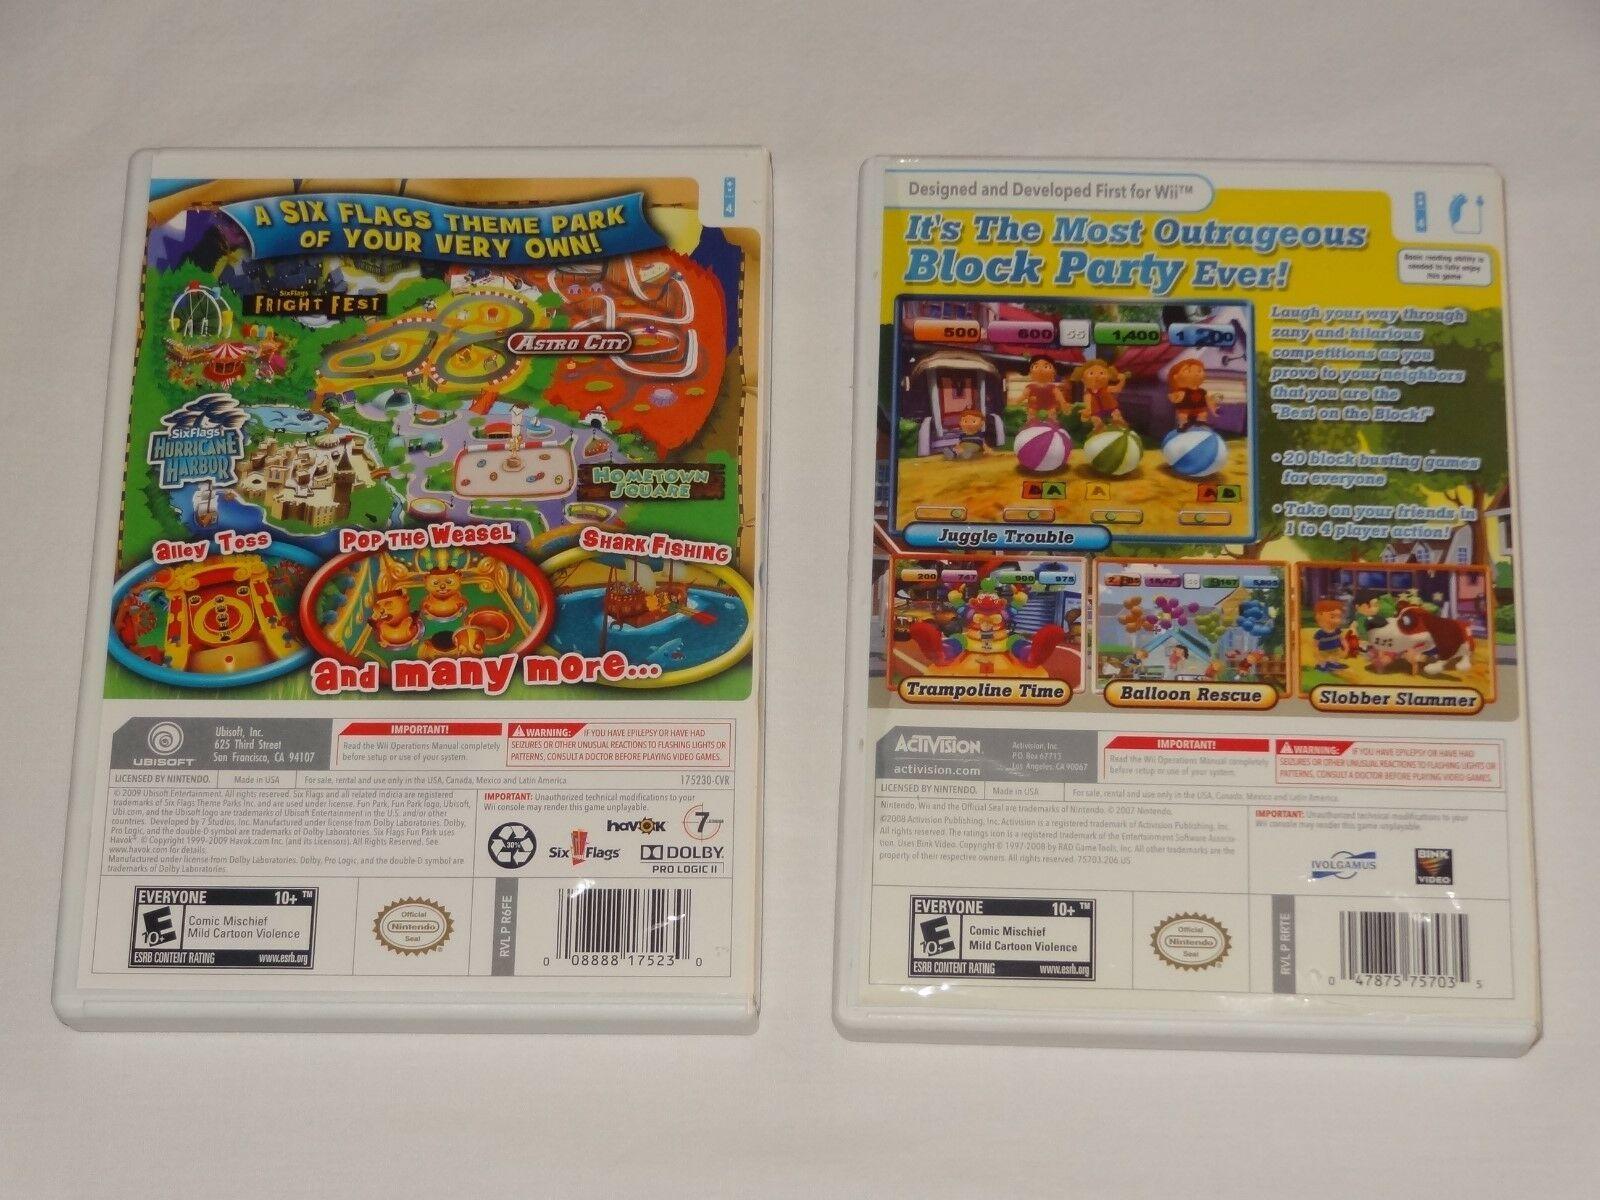 Six Flags Fun Park - Nintendo Wii UBI Soft + Block Party 20 Games Activision image 3